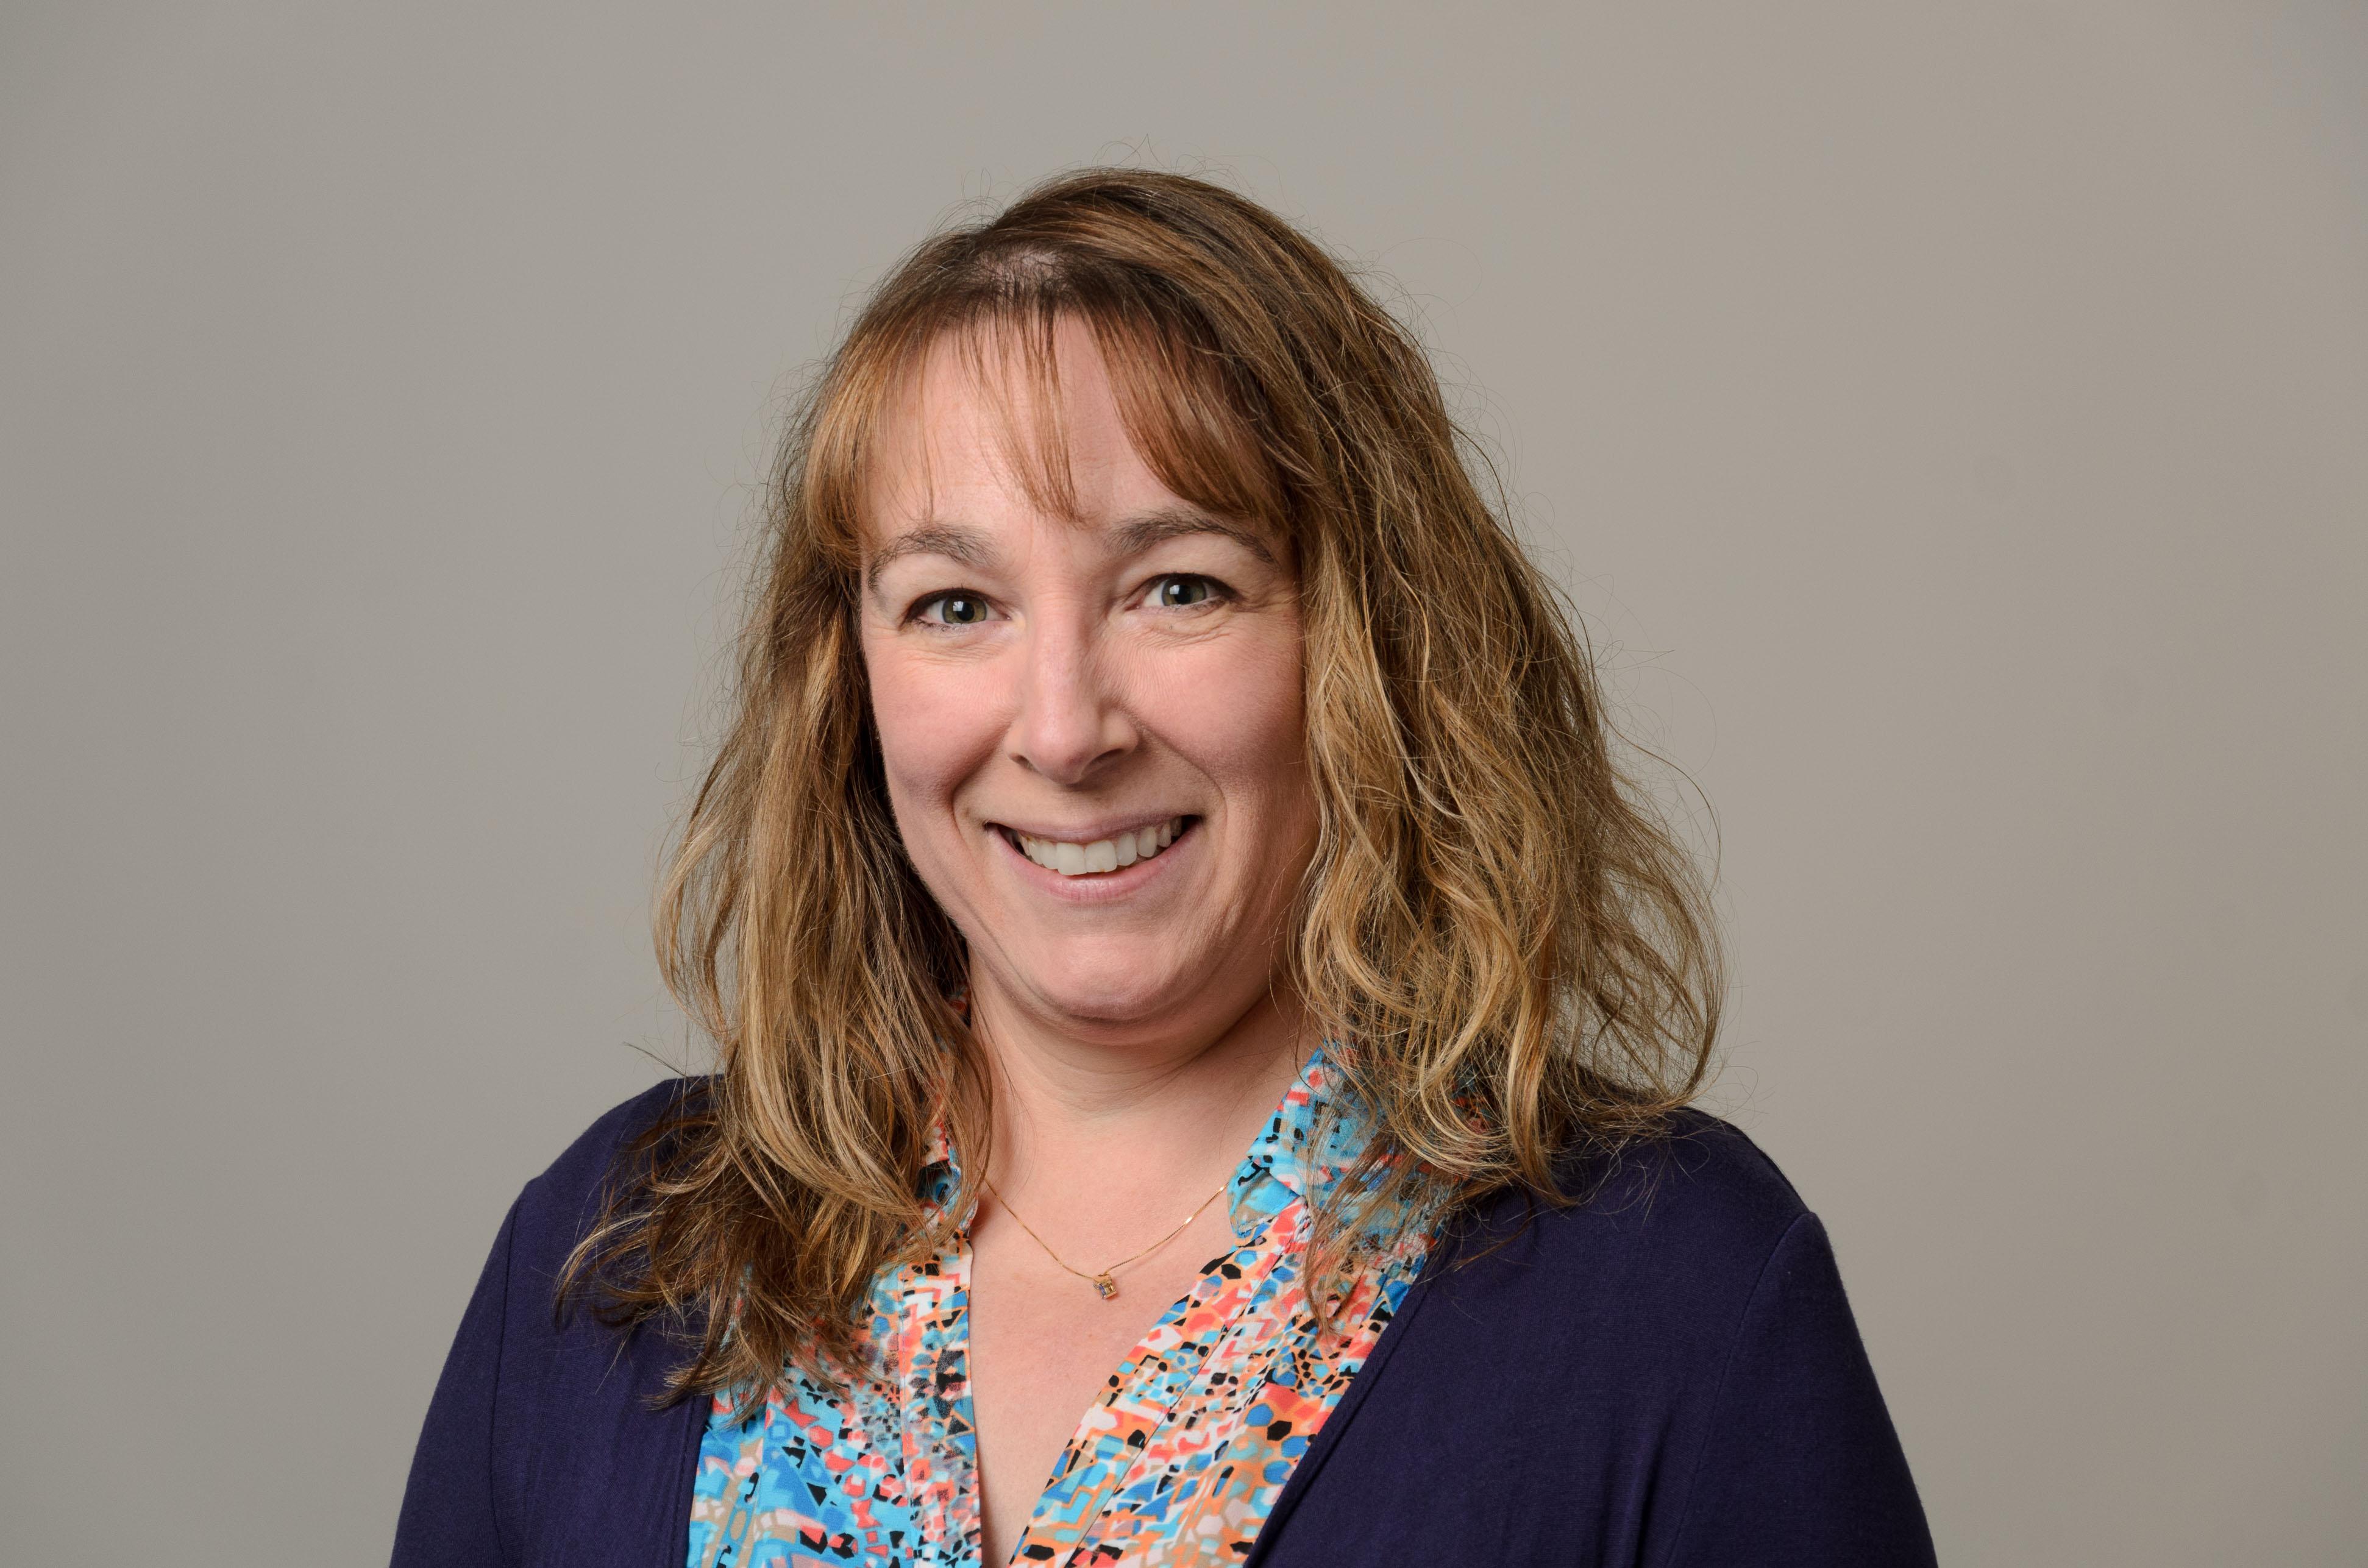 Headshot of Valerie Brangan. Teal patterned shirt, purple sweater.